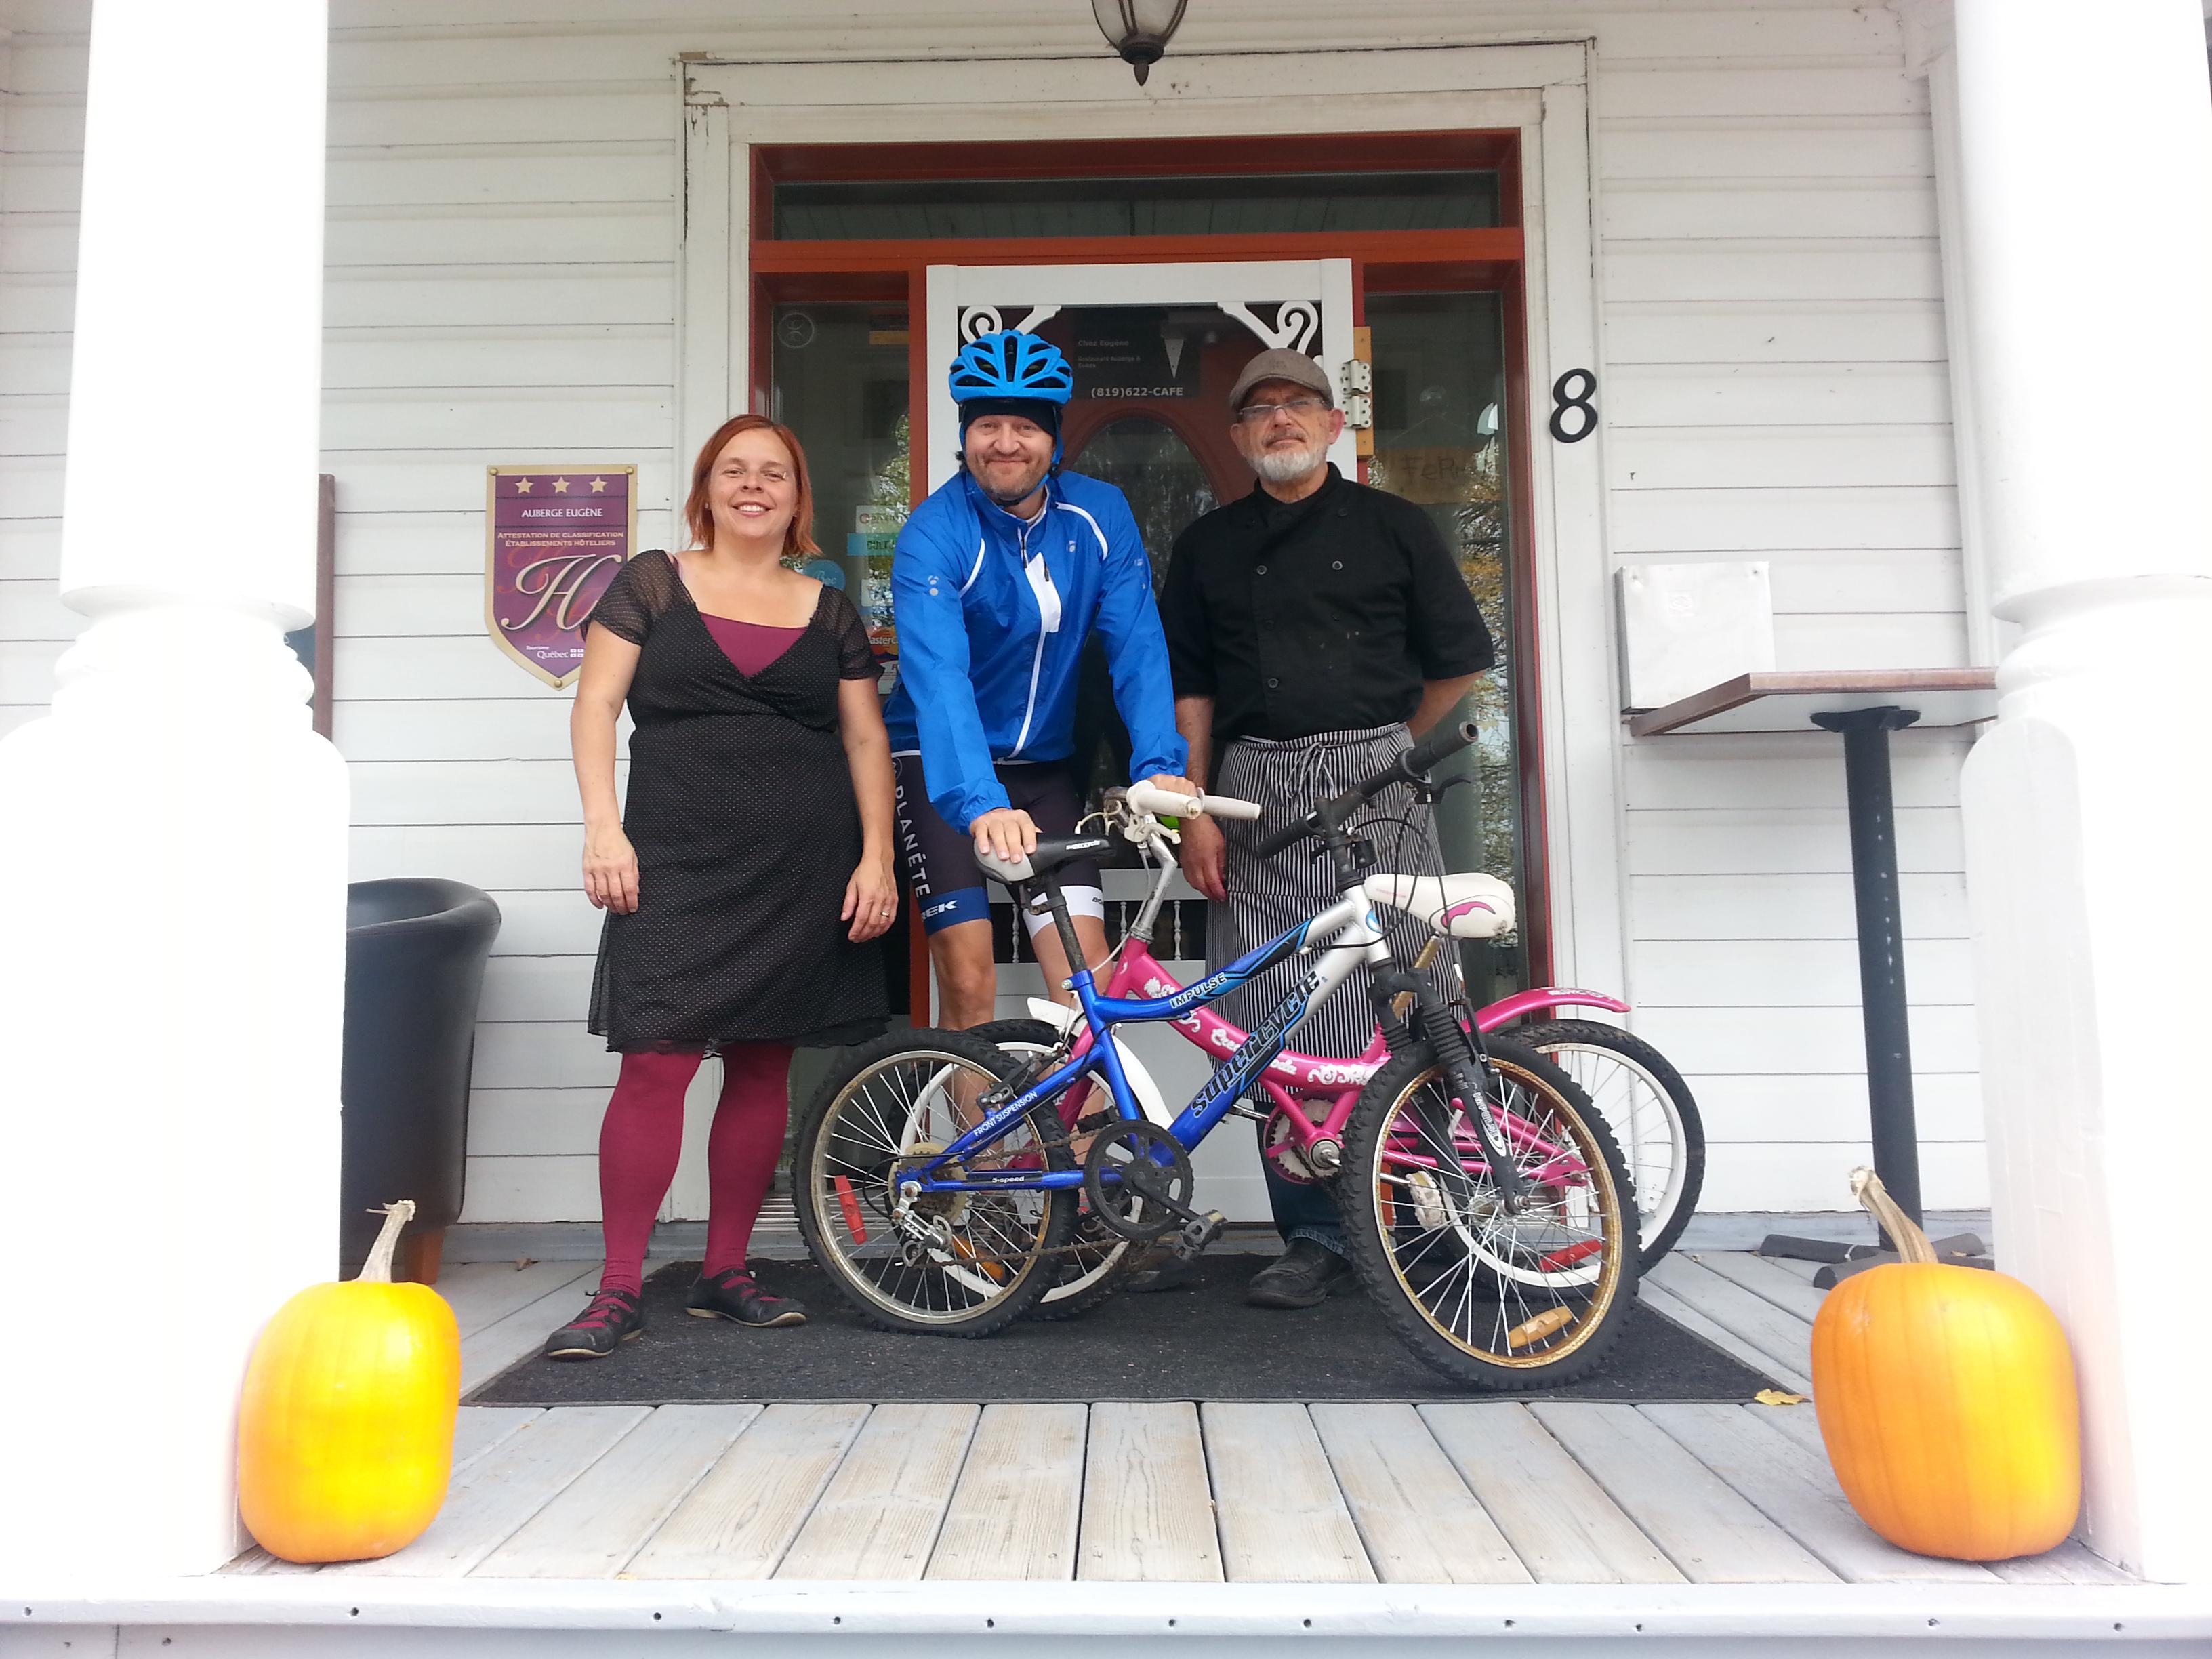 vélos usagés écolo collecte